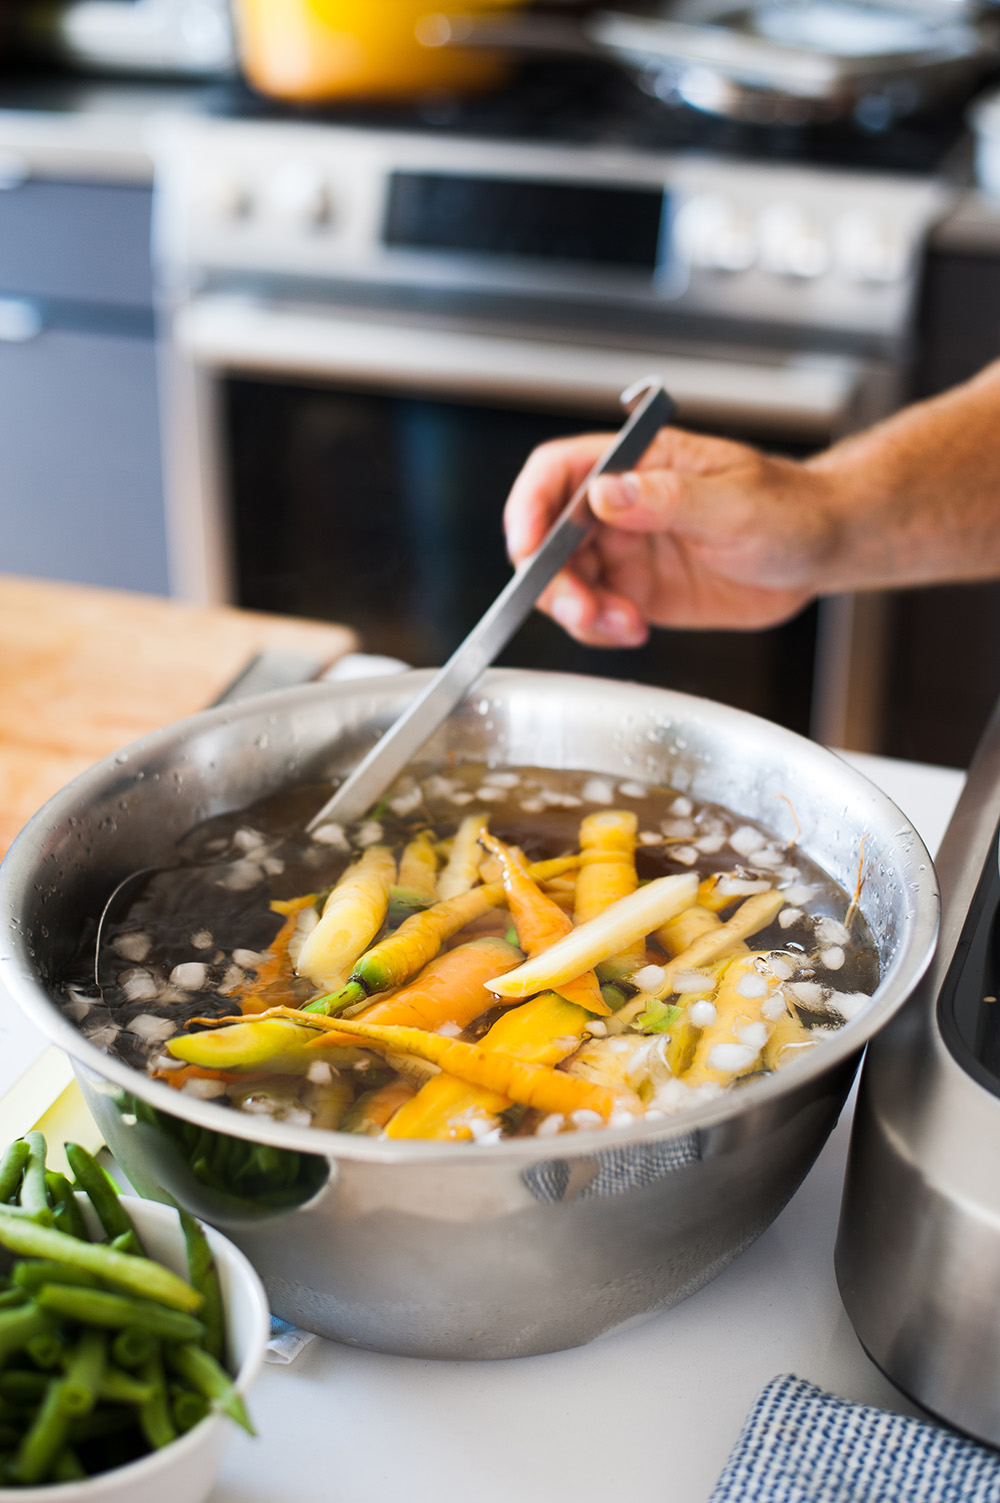 Organic yellow carrots soak in a metal bowl